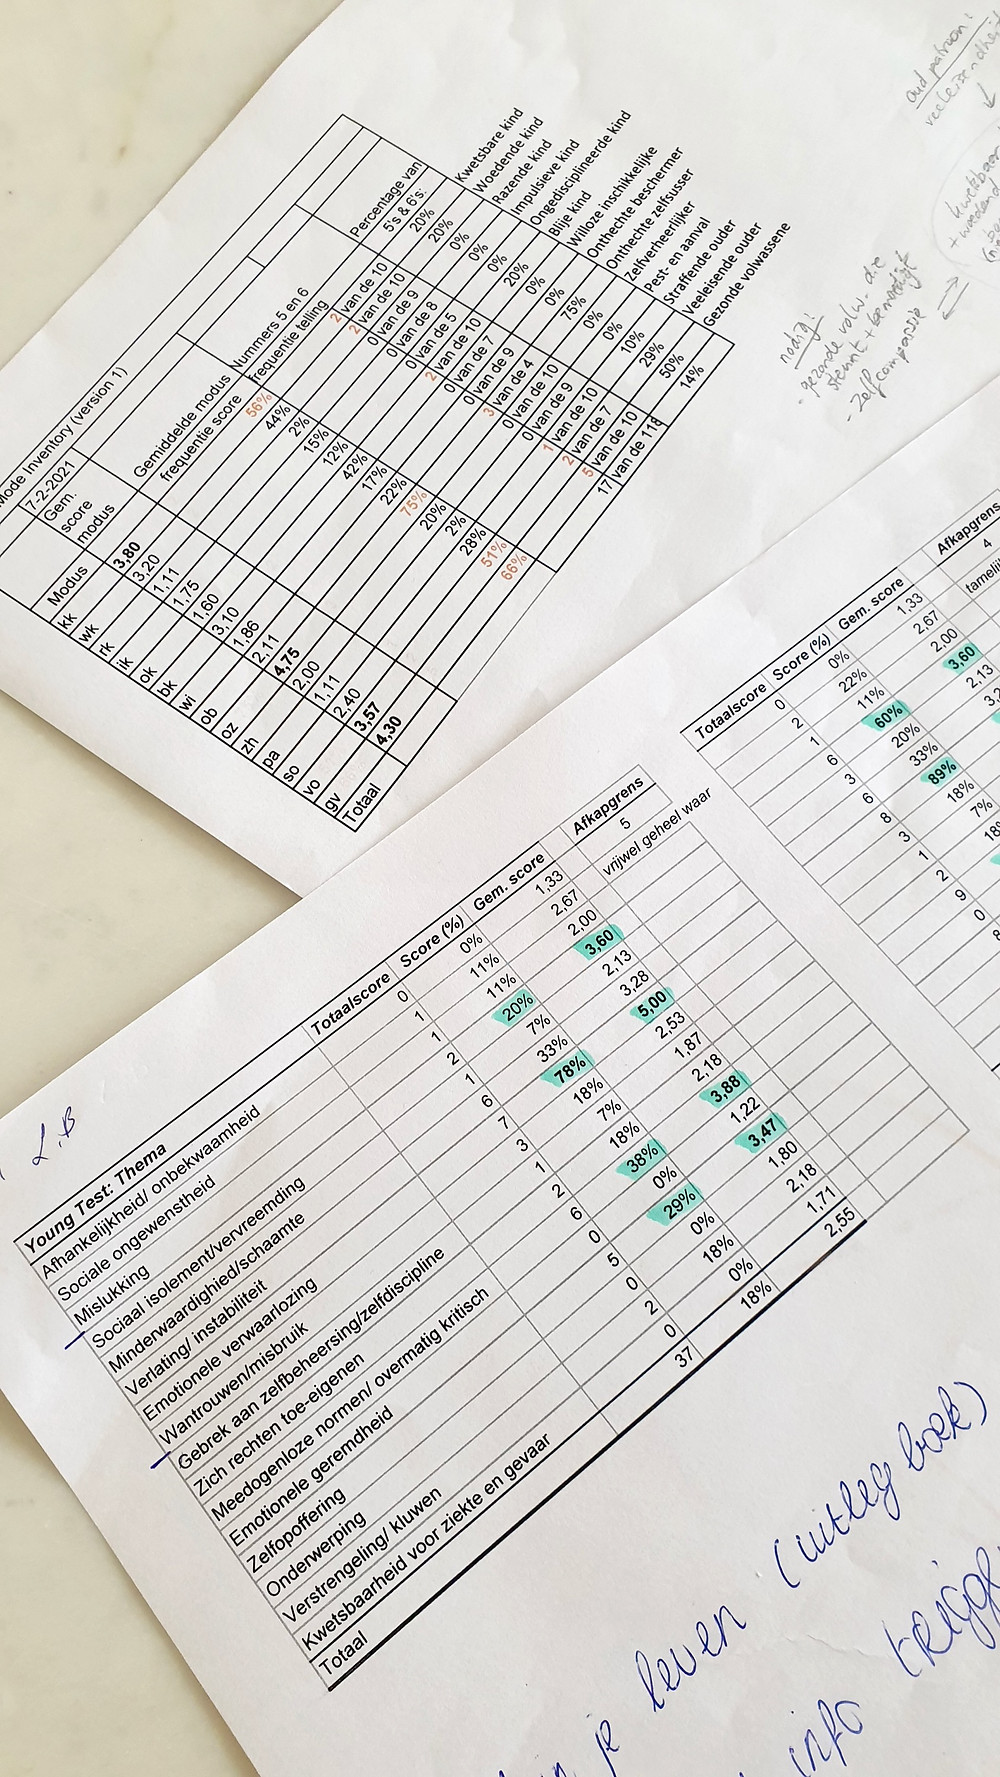 Therapie   ongerouwde rouw   Schema modi Inventory   Young Schema Questionnaire   leren echt ontspannen   Depressie   ervaring   adhd   antidepressiva   adhd medicatie   puur leven   zelfzorg   Instagram @lizaelvira.nl